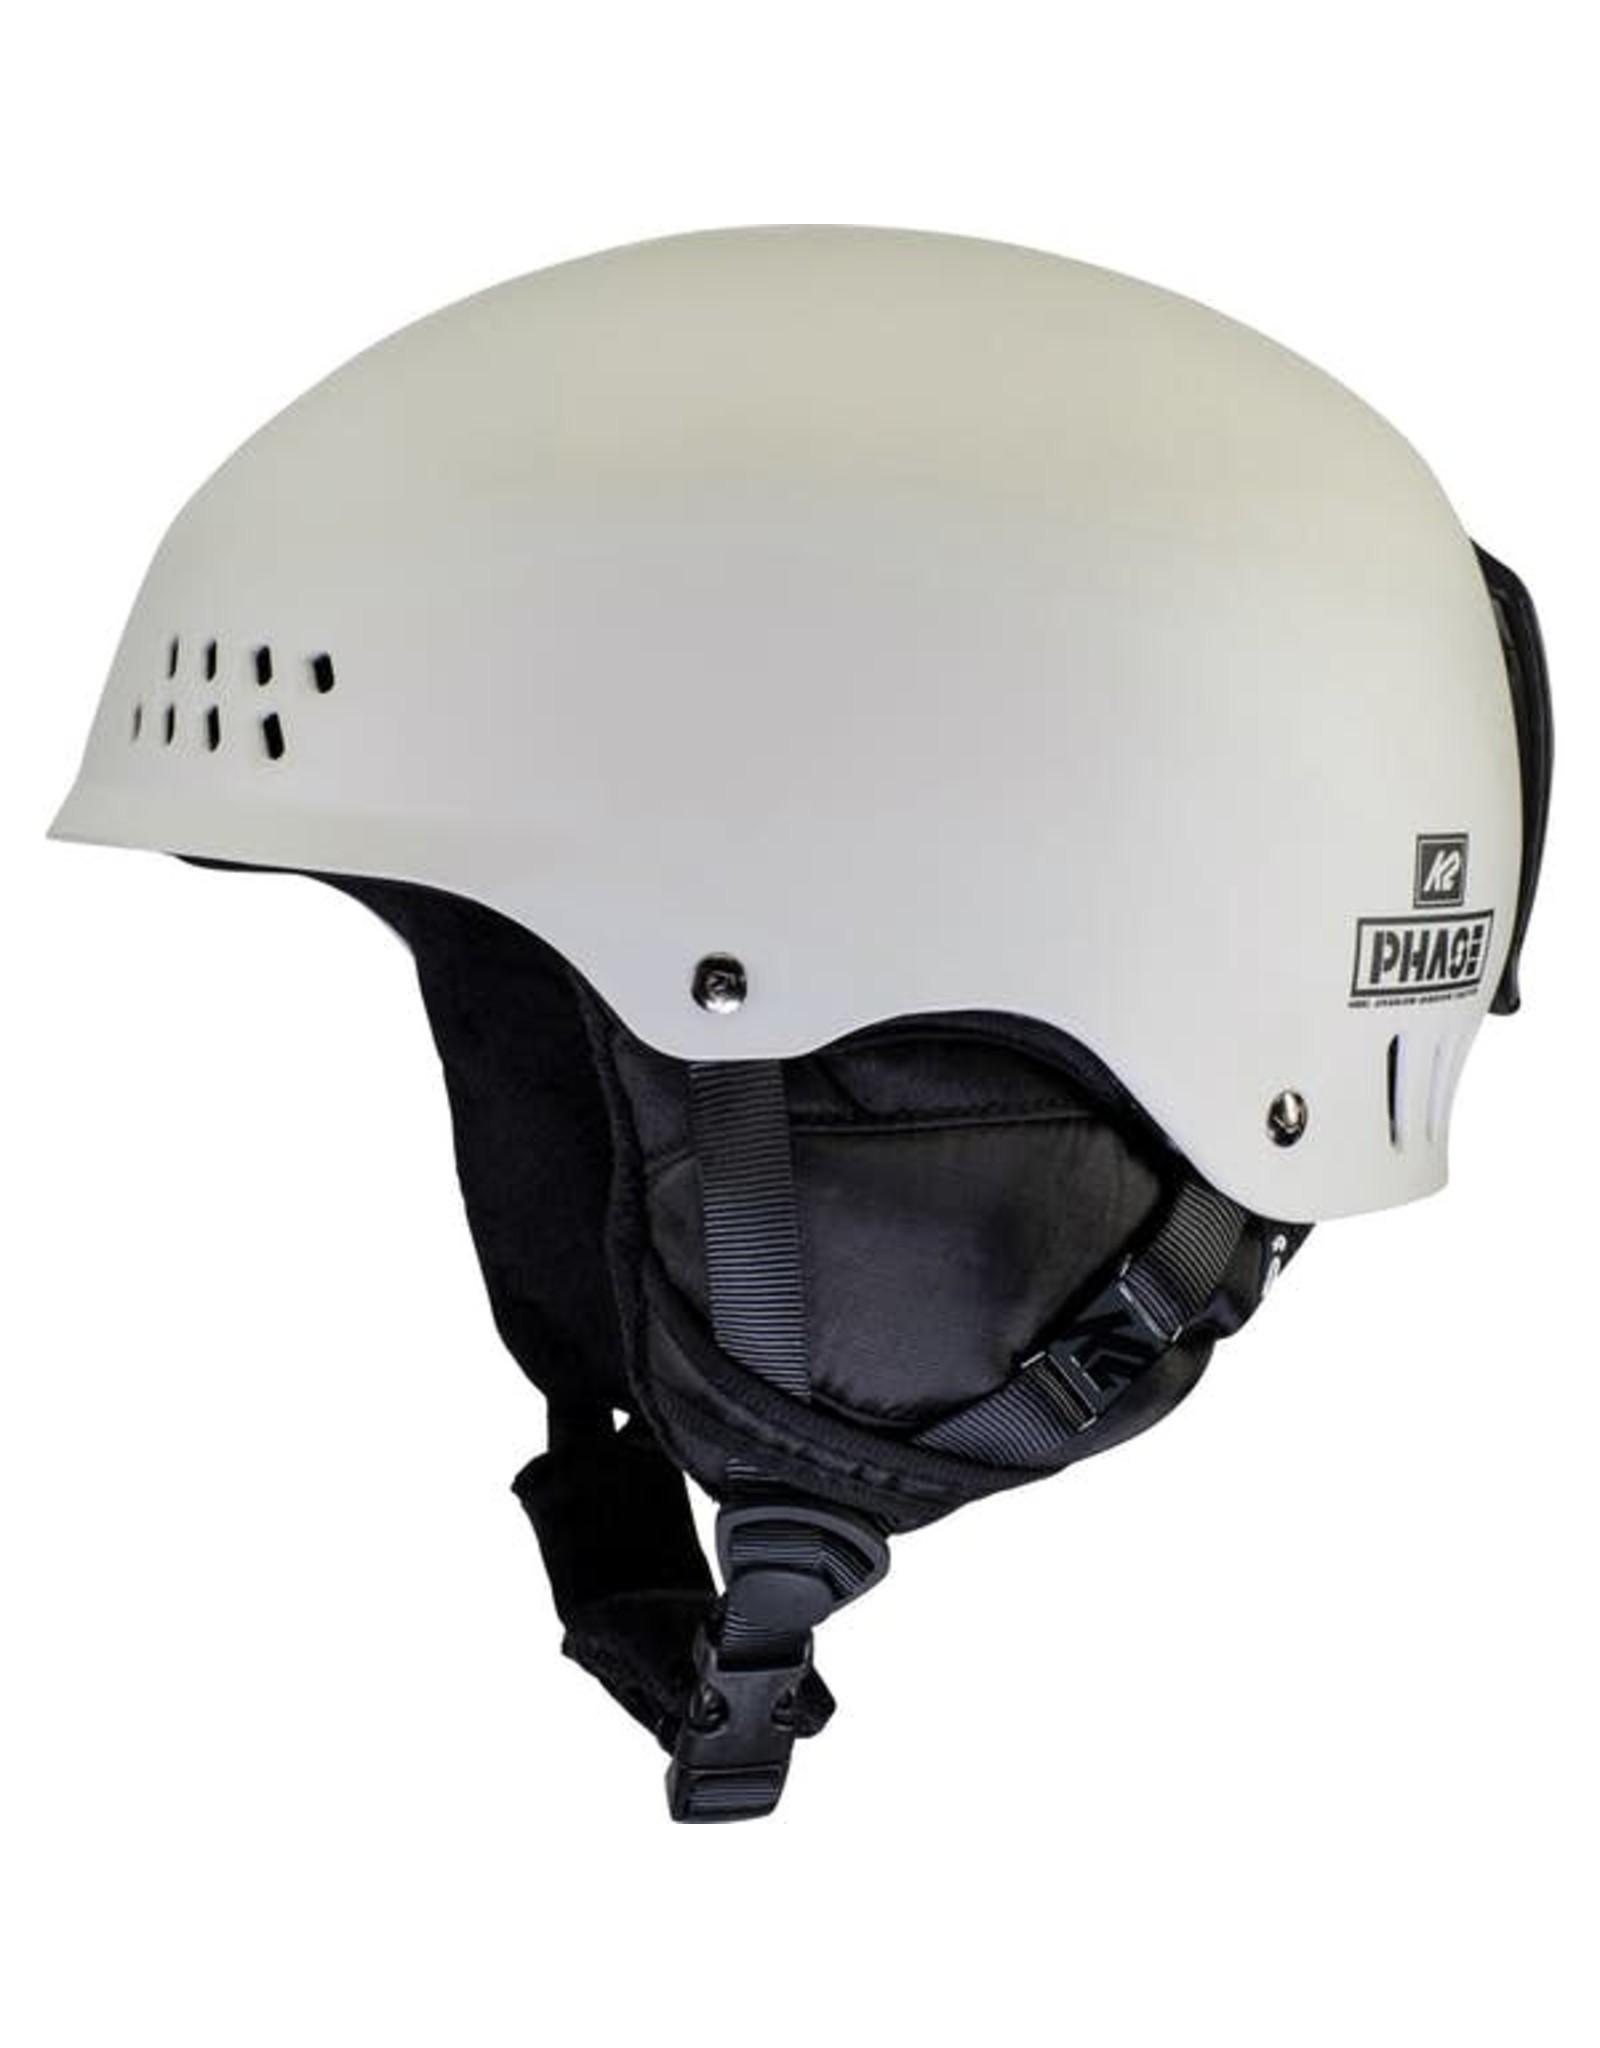 K2 K2 PHASE PRO SR WHT SKI HELMET